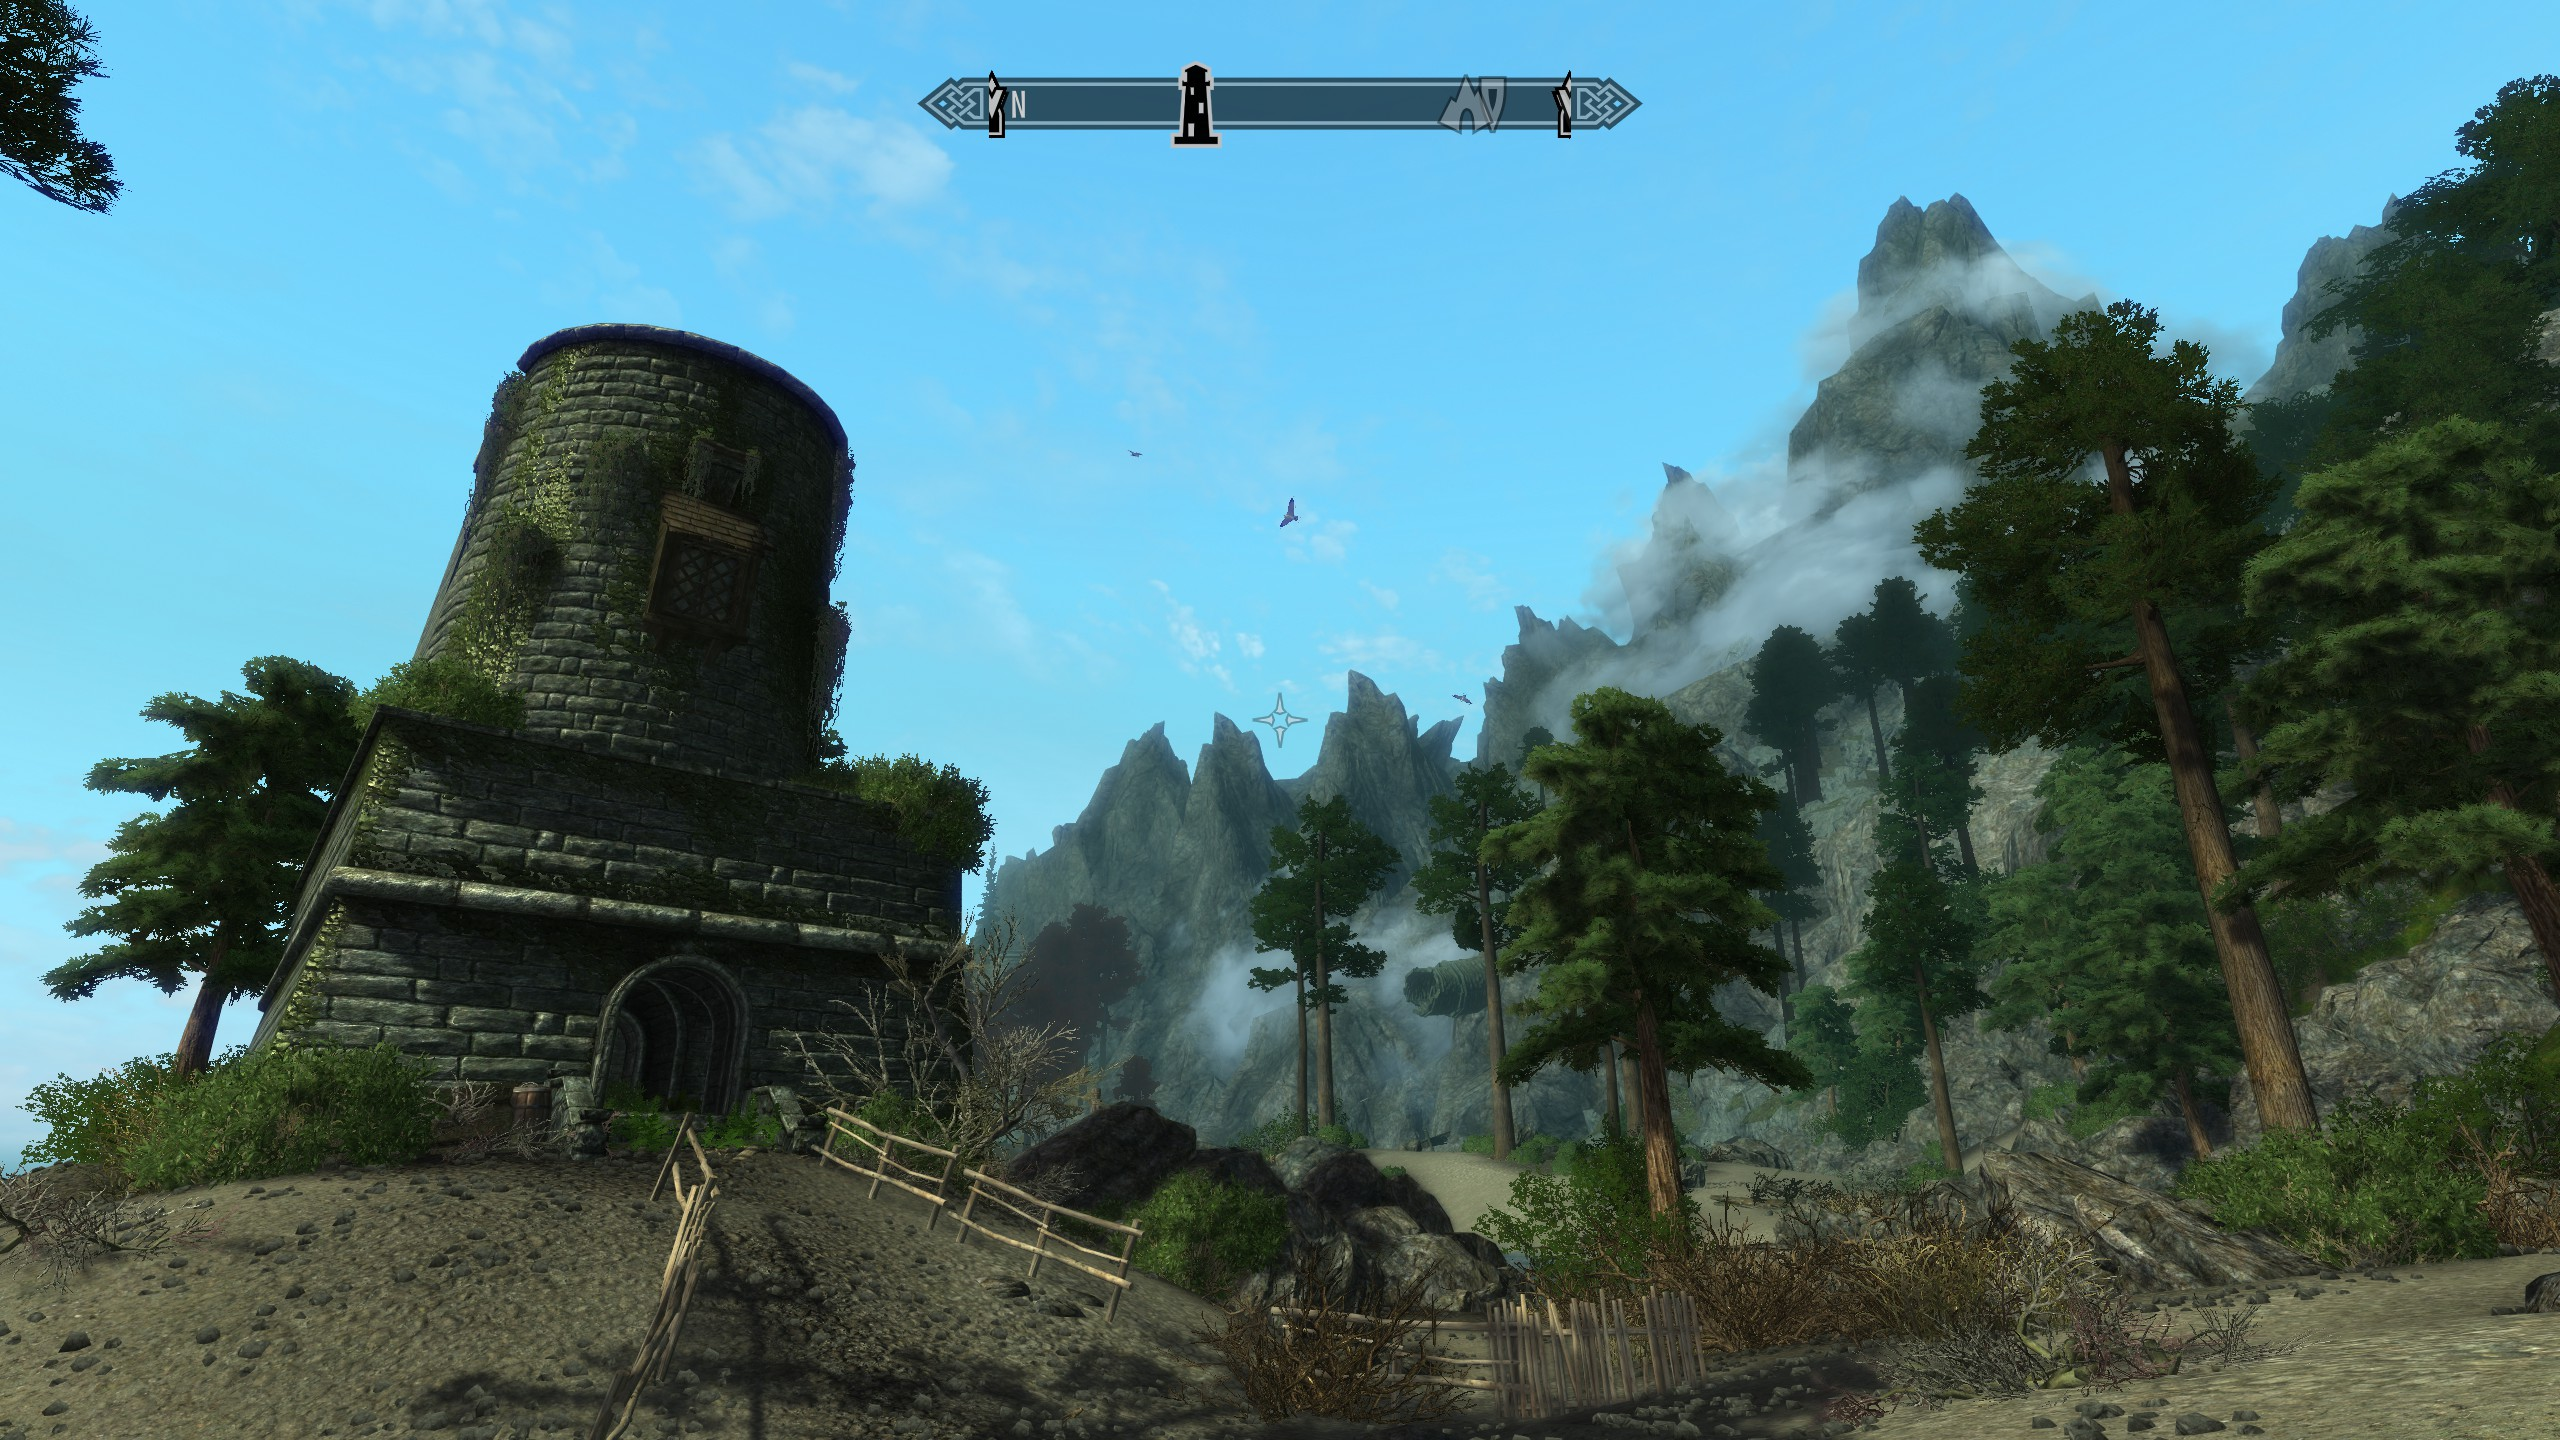 Enderal: Forgotten Stories - Elder Scrolls 5: Skyrim, the